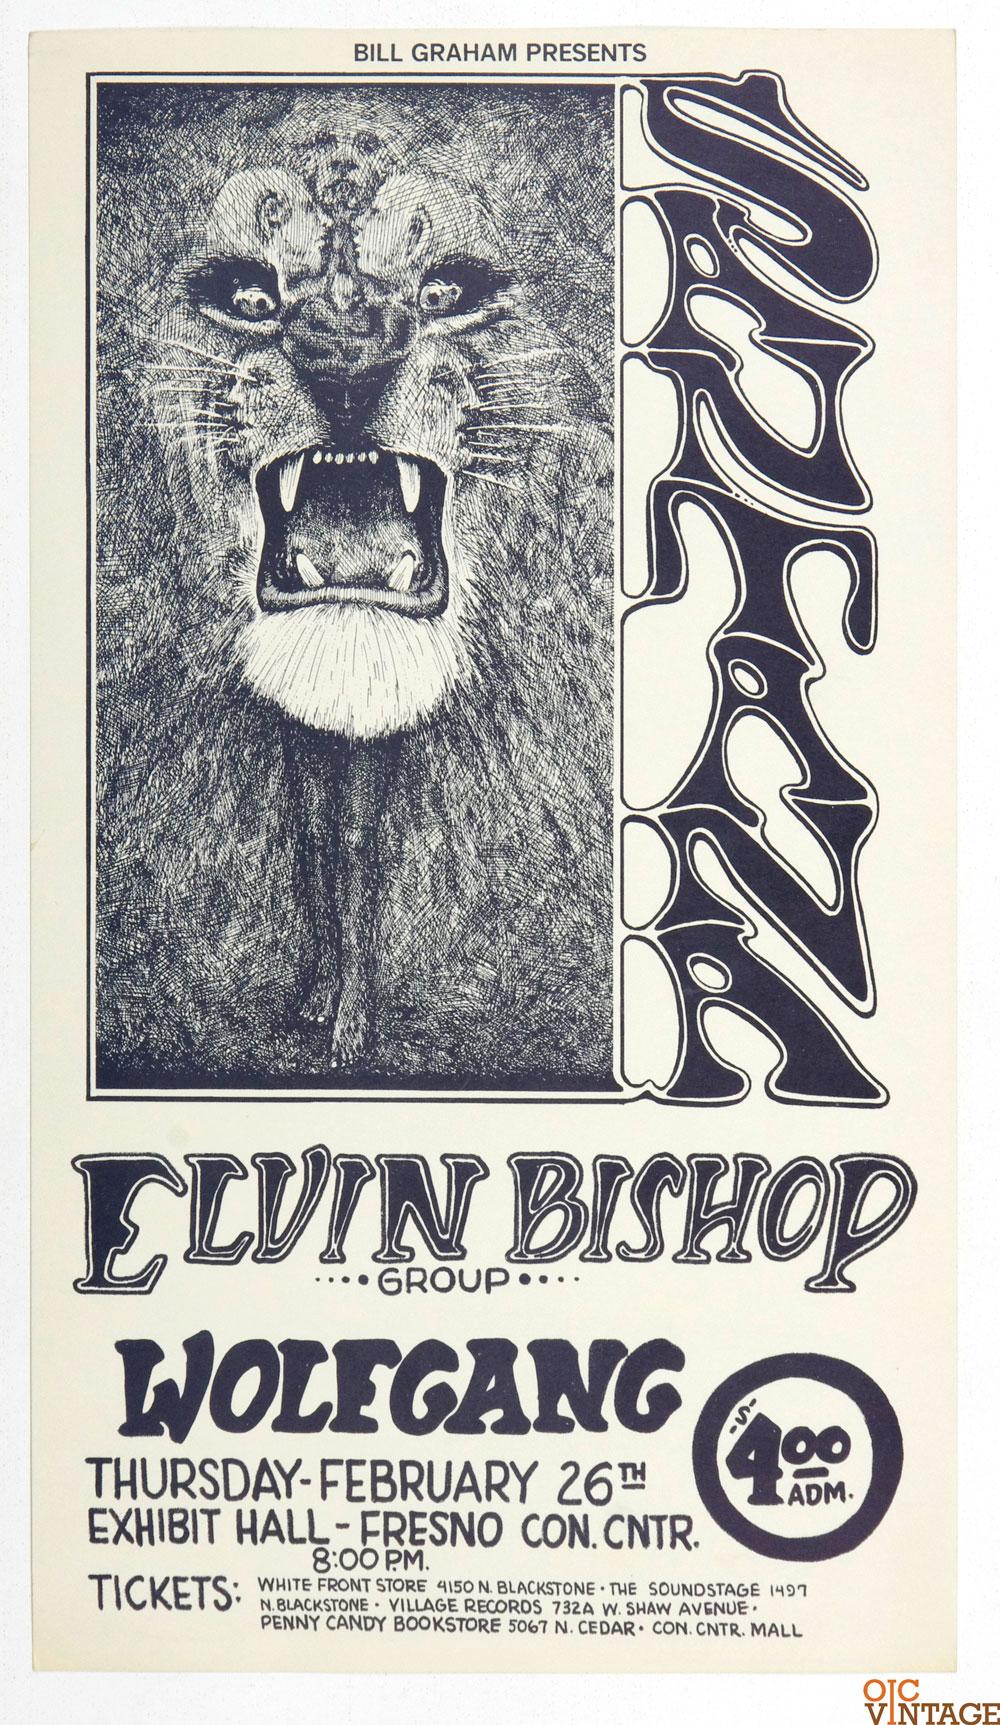 Bill Graham Presents Poster 1970 Feb 26 Santana Elvin Bishop Fresno Exhibition Hall